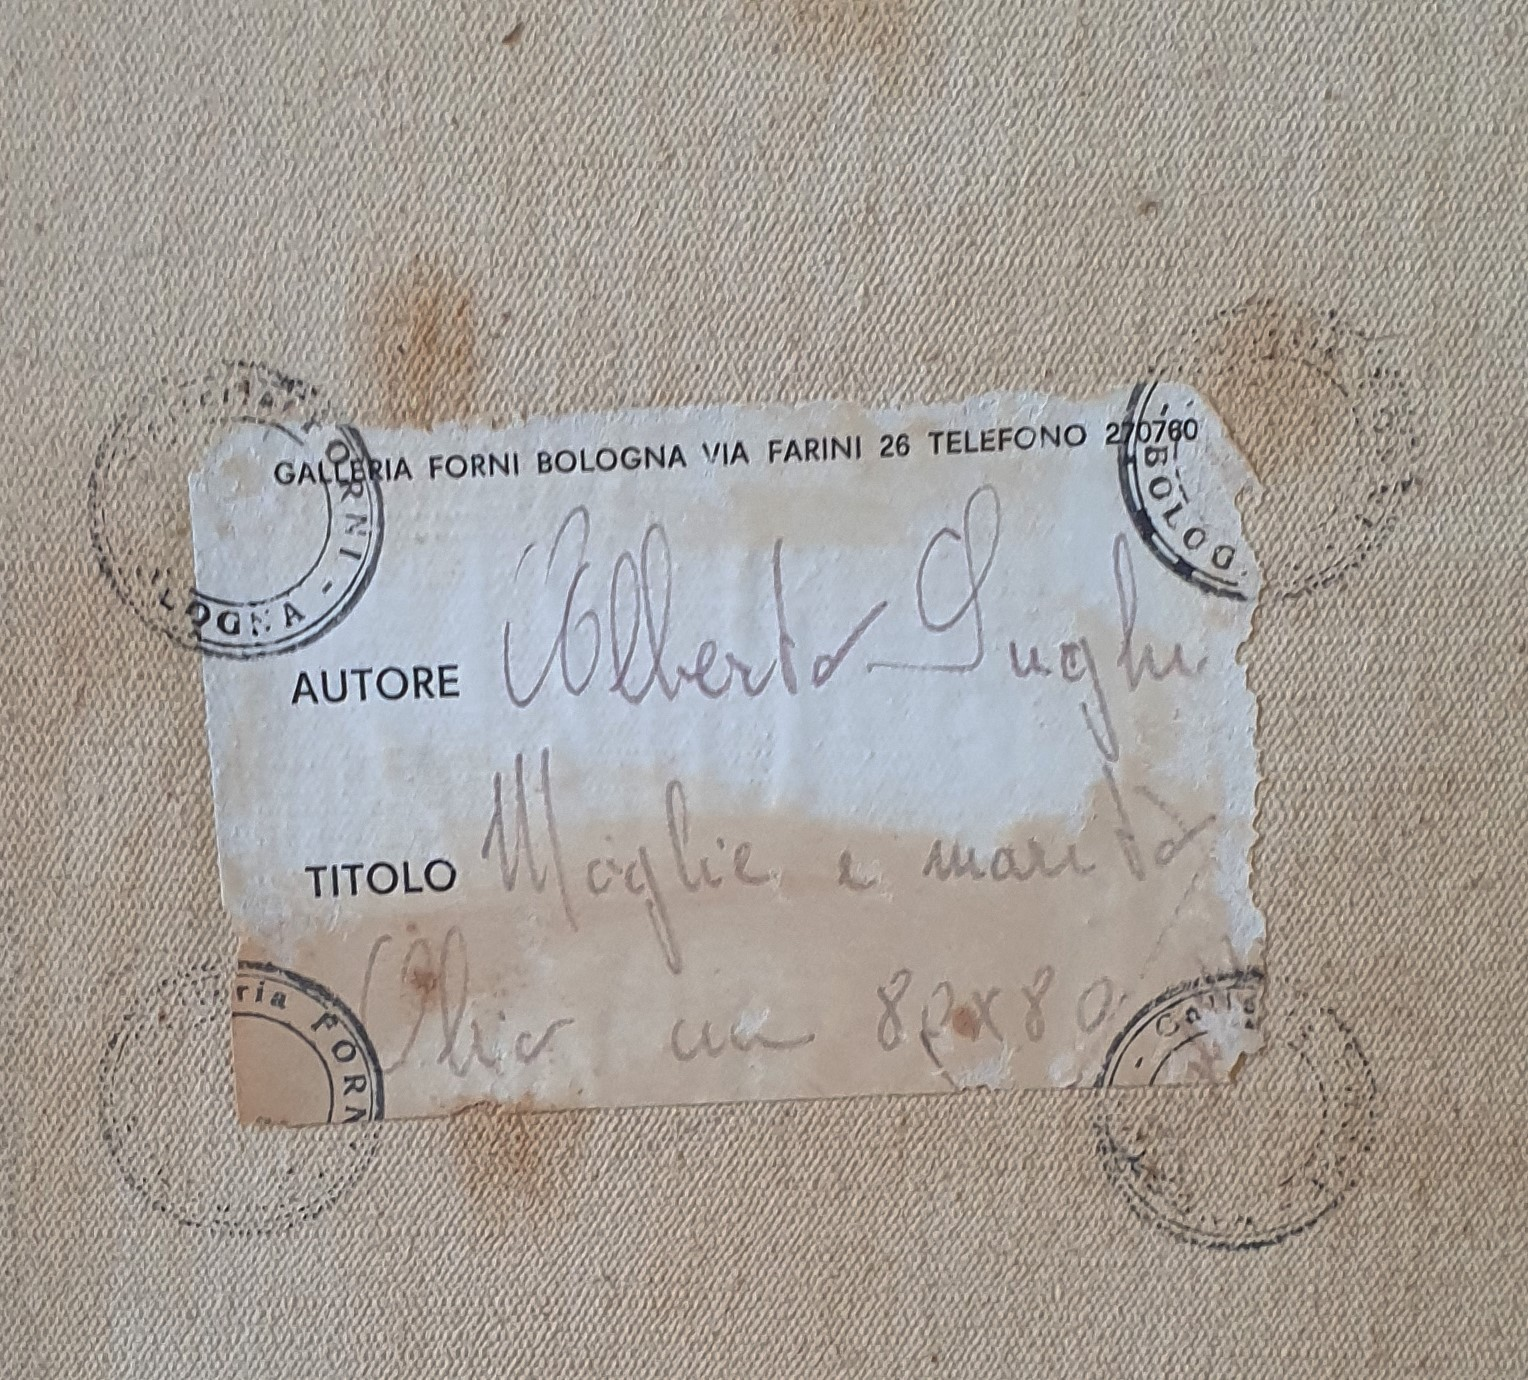 thumb2|阿尔贝托·苏吉(Alberto Sughi),《妻子与丈夫》,1967年。